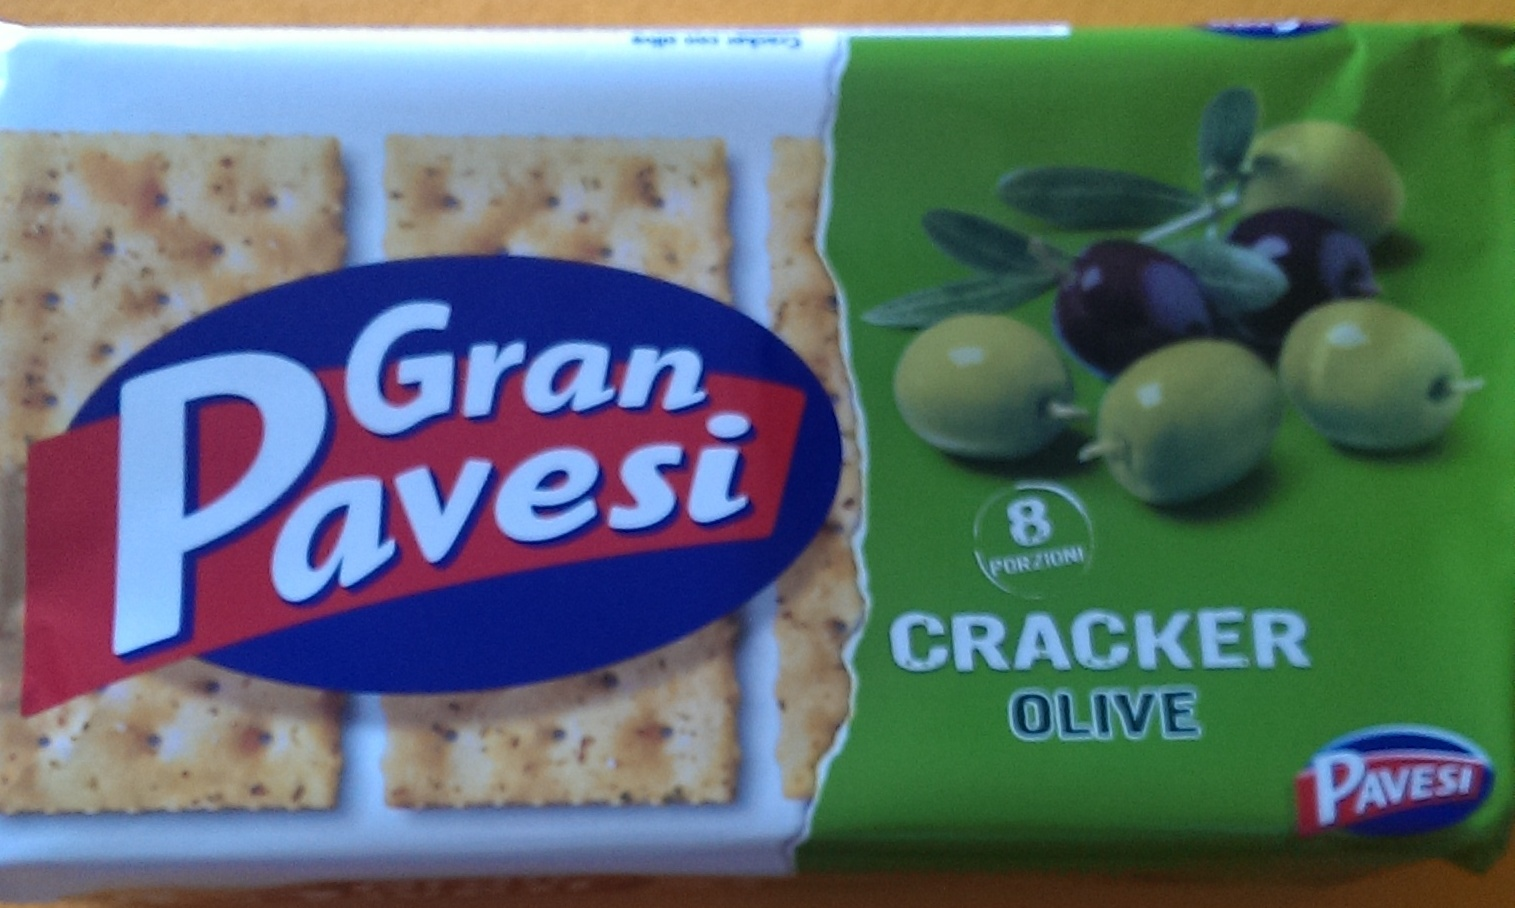 Gran Pavesi Cracker Olive - Product